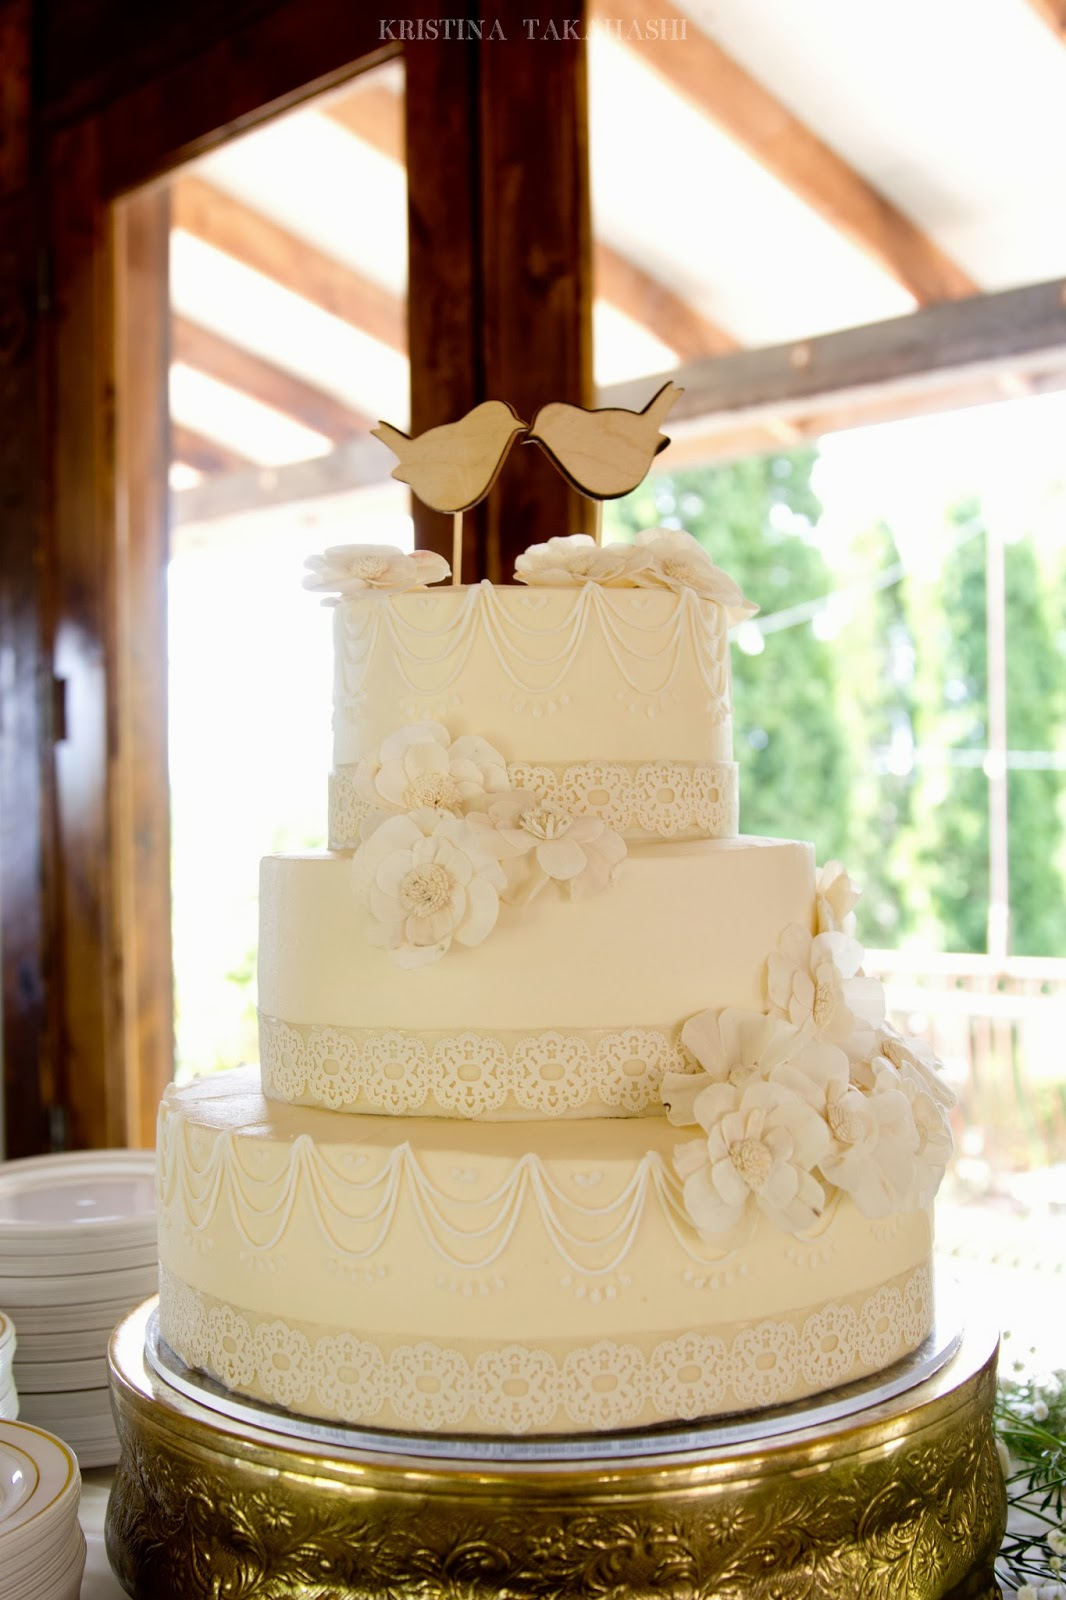 Kristina Takahashi: Jenni and Eddie| Married | Wadley Farms- Details